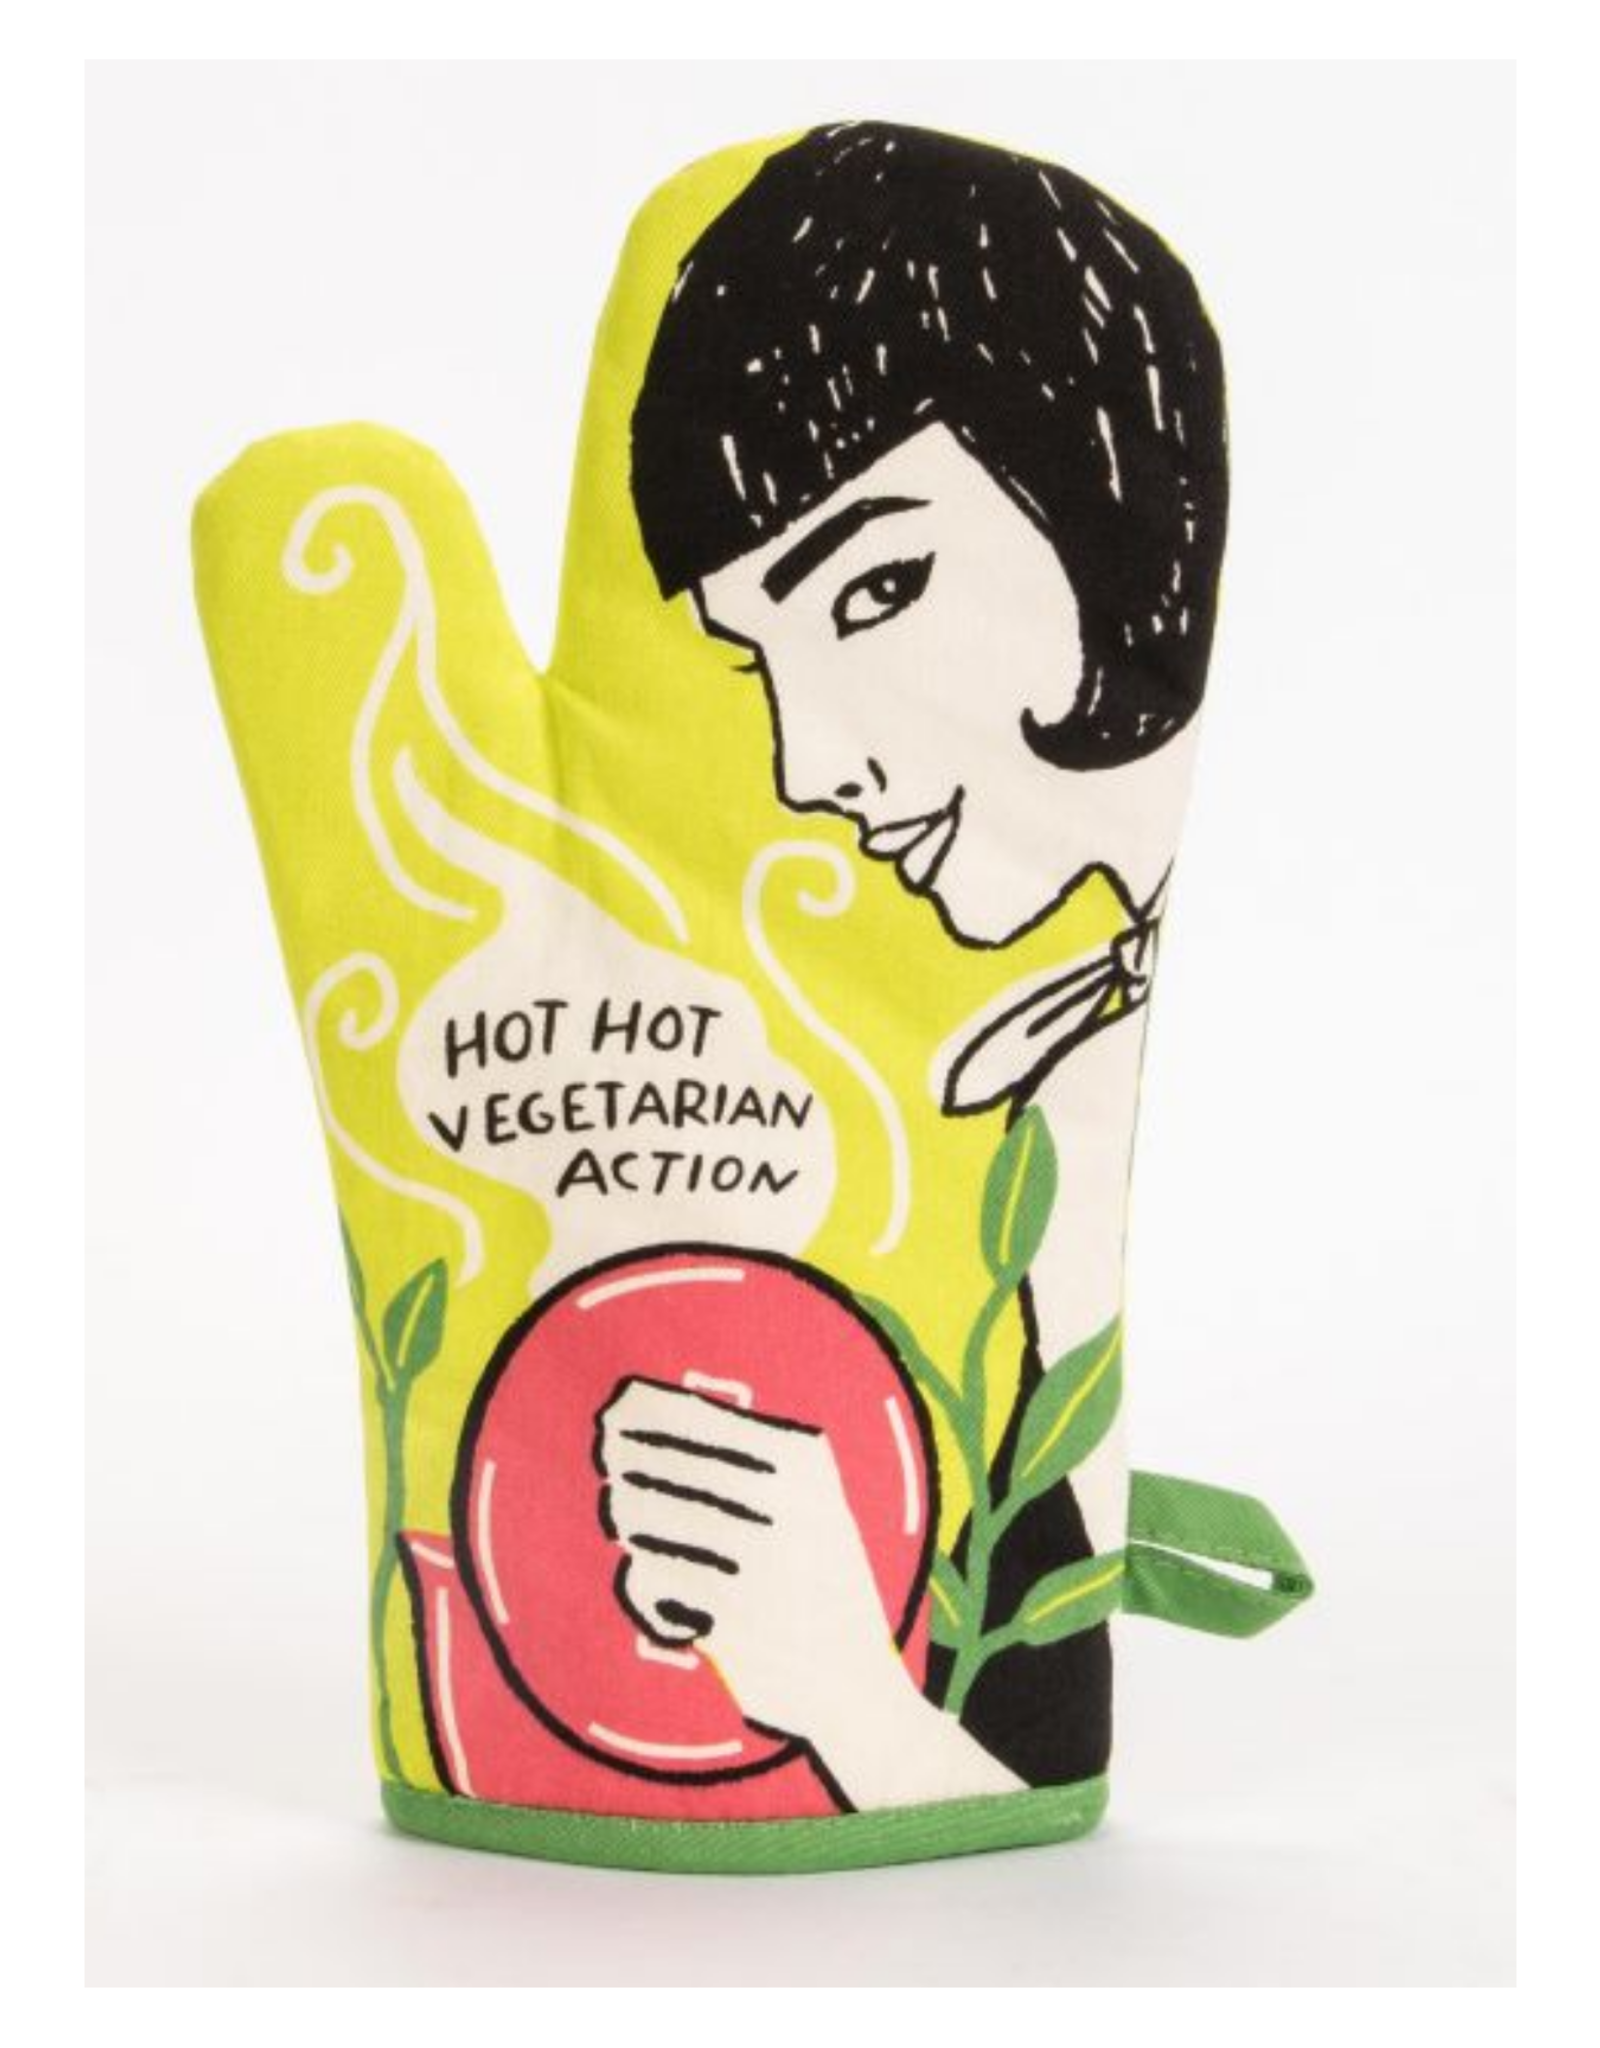 Hot, Hot Vegetarian Action Oven Mitt